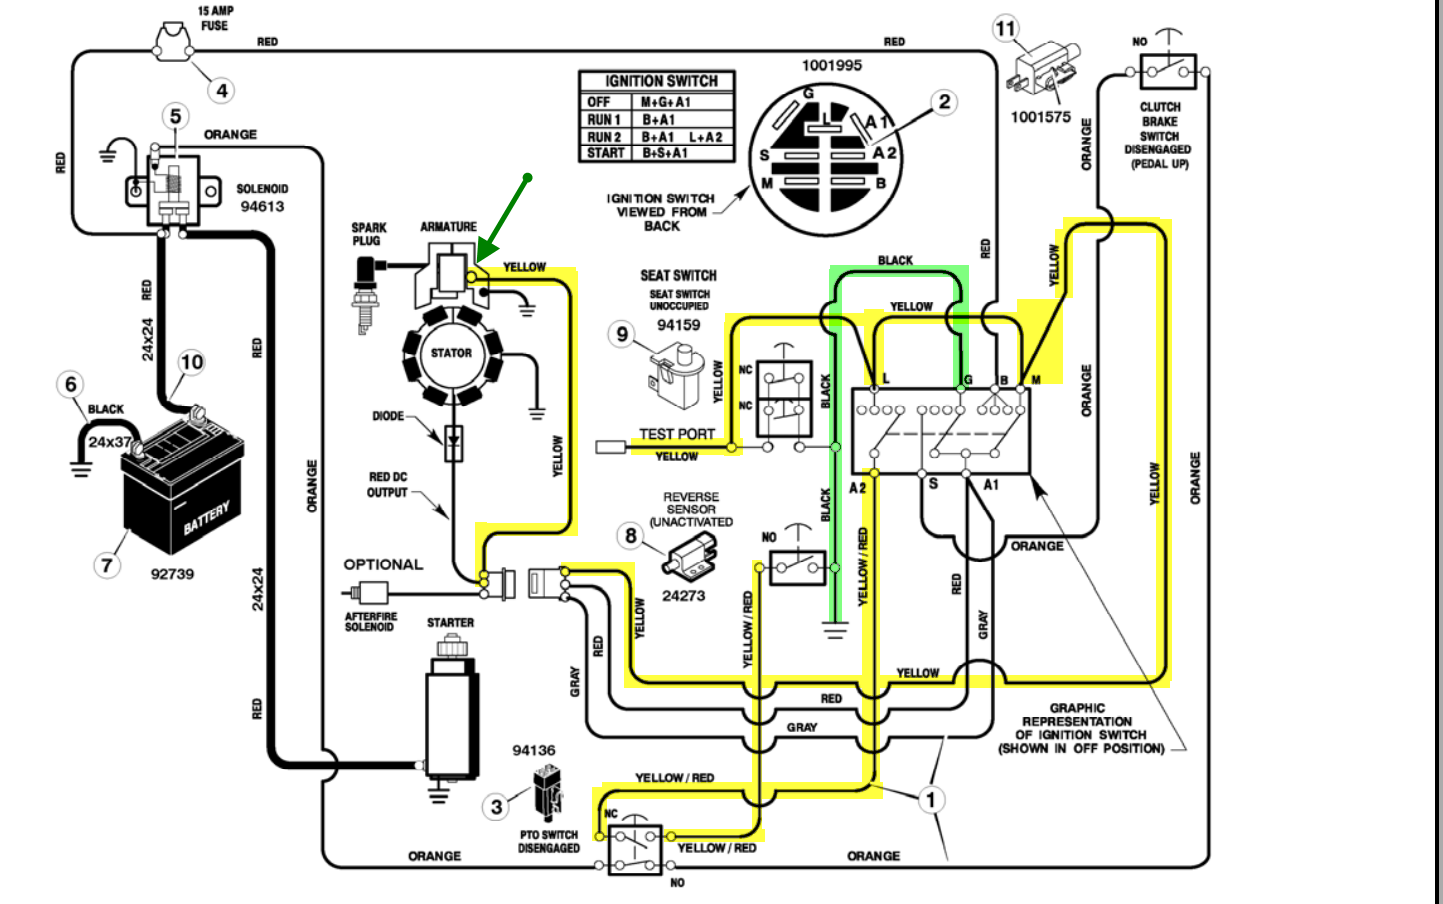 medium resolution of 10 hp briggs parts diagram wiring schematic wiring diagram for you